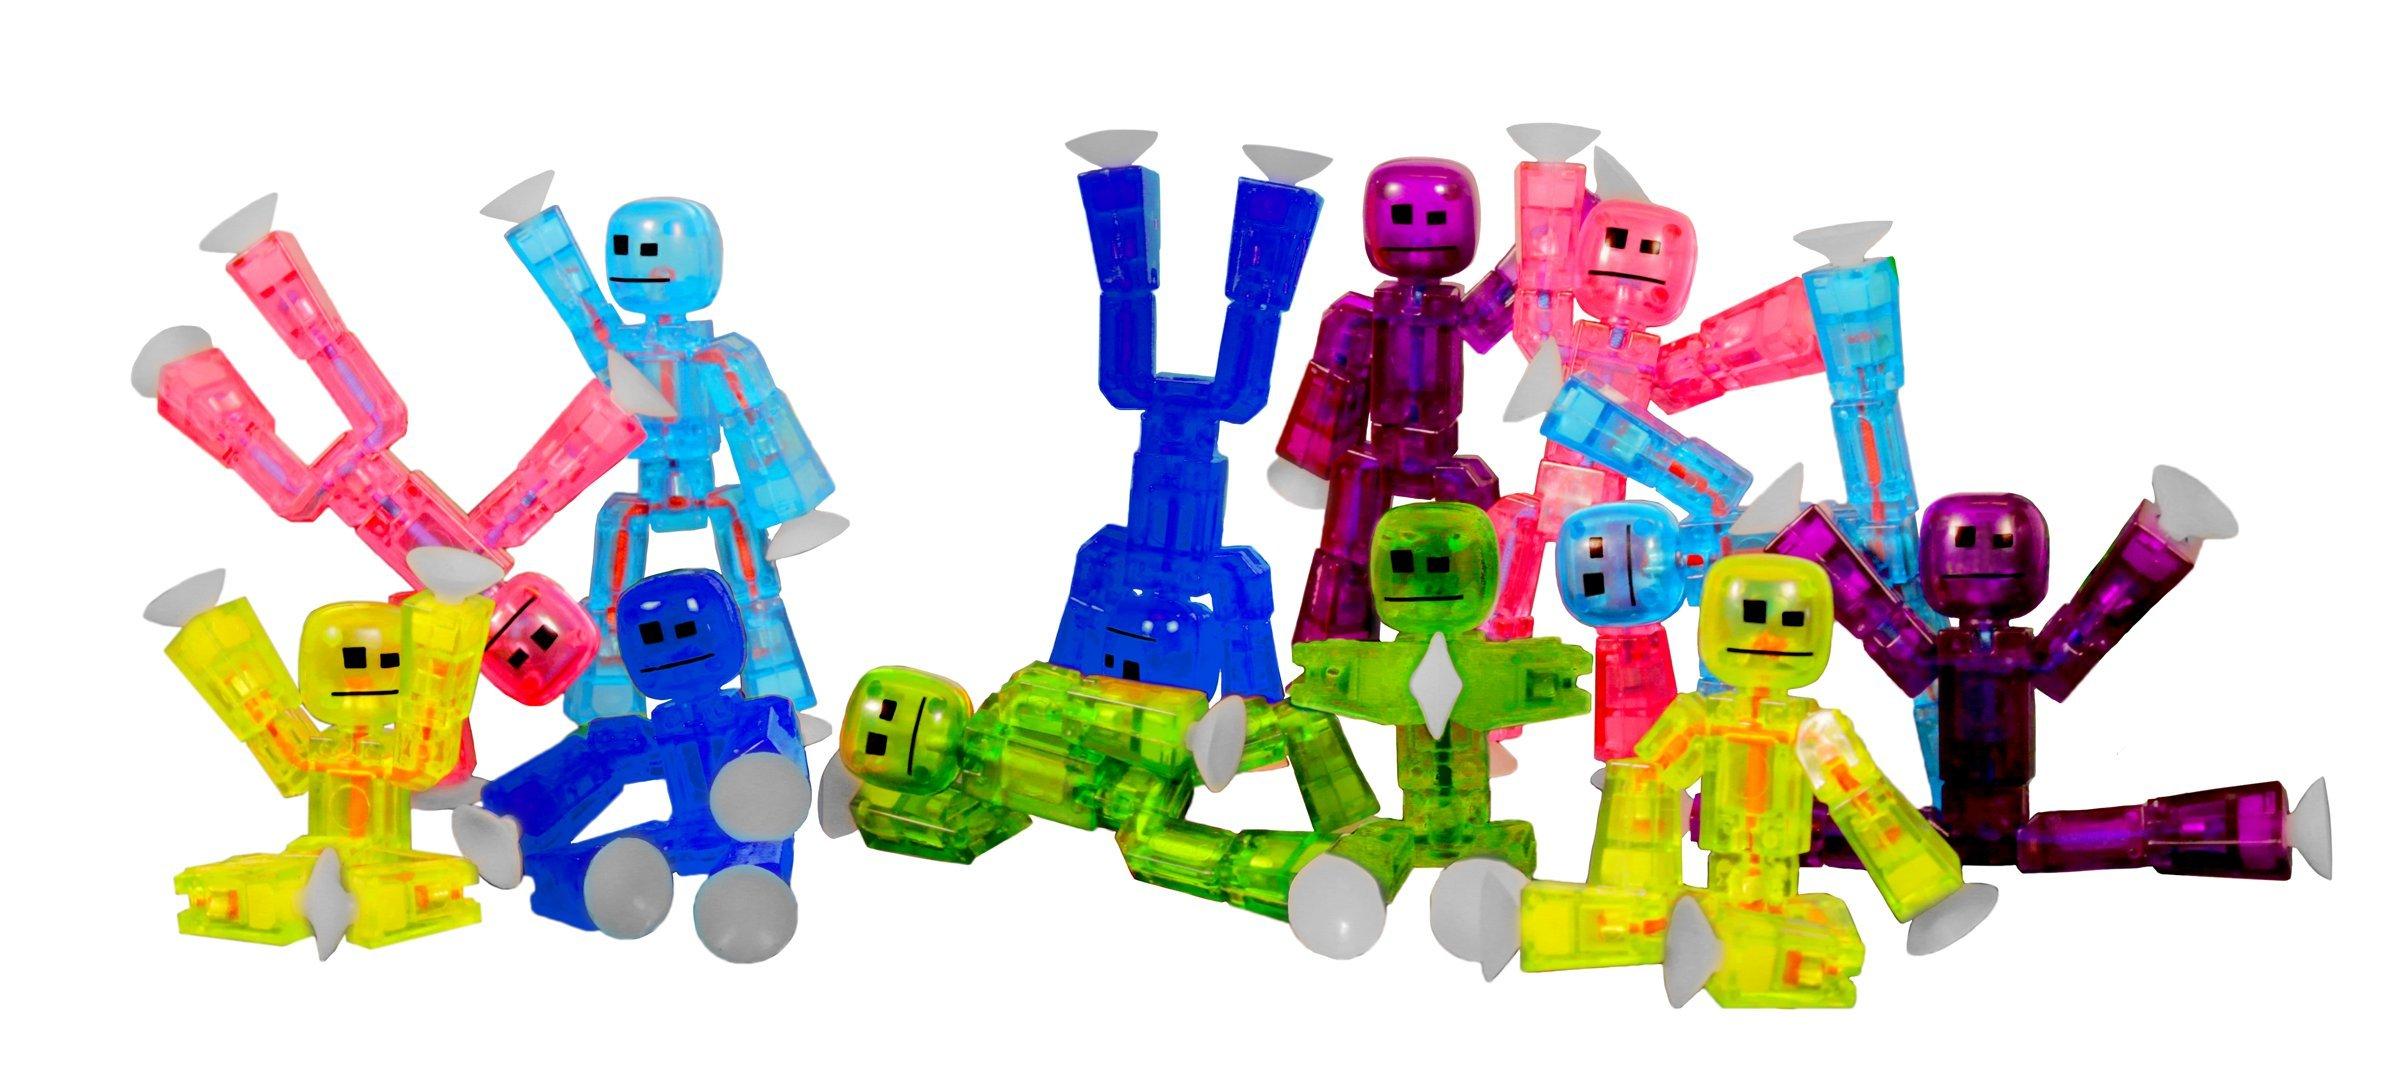 Zing Stikbots Action Figure (12 Units) 6